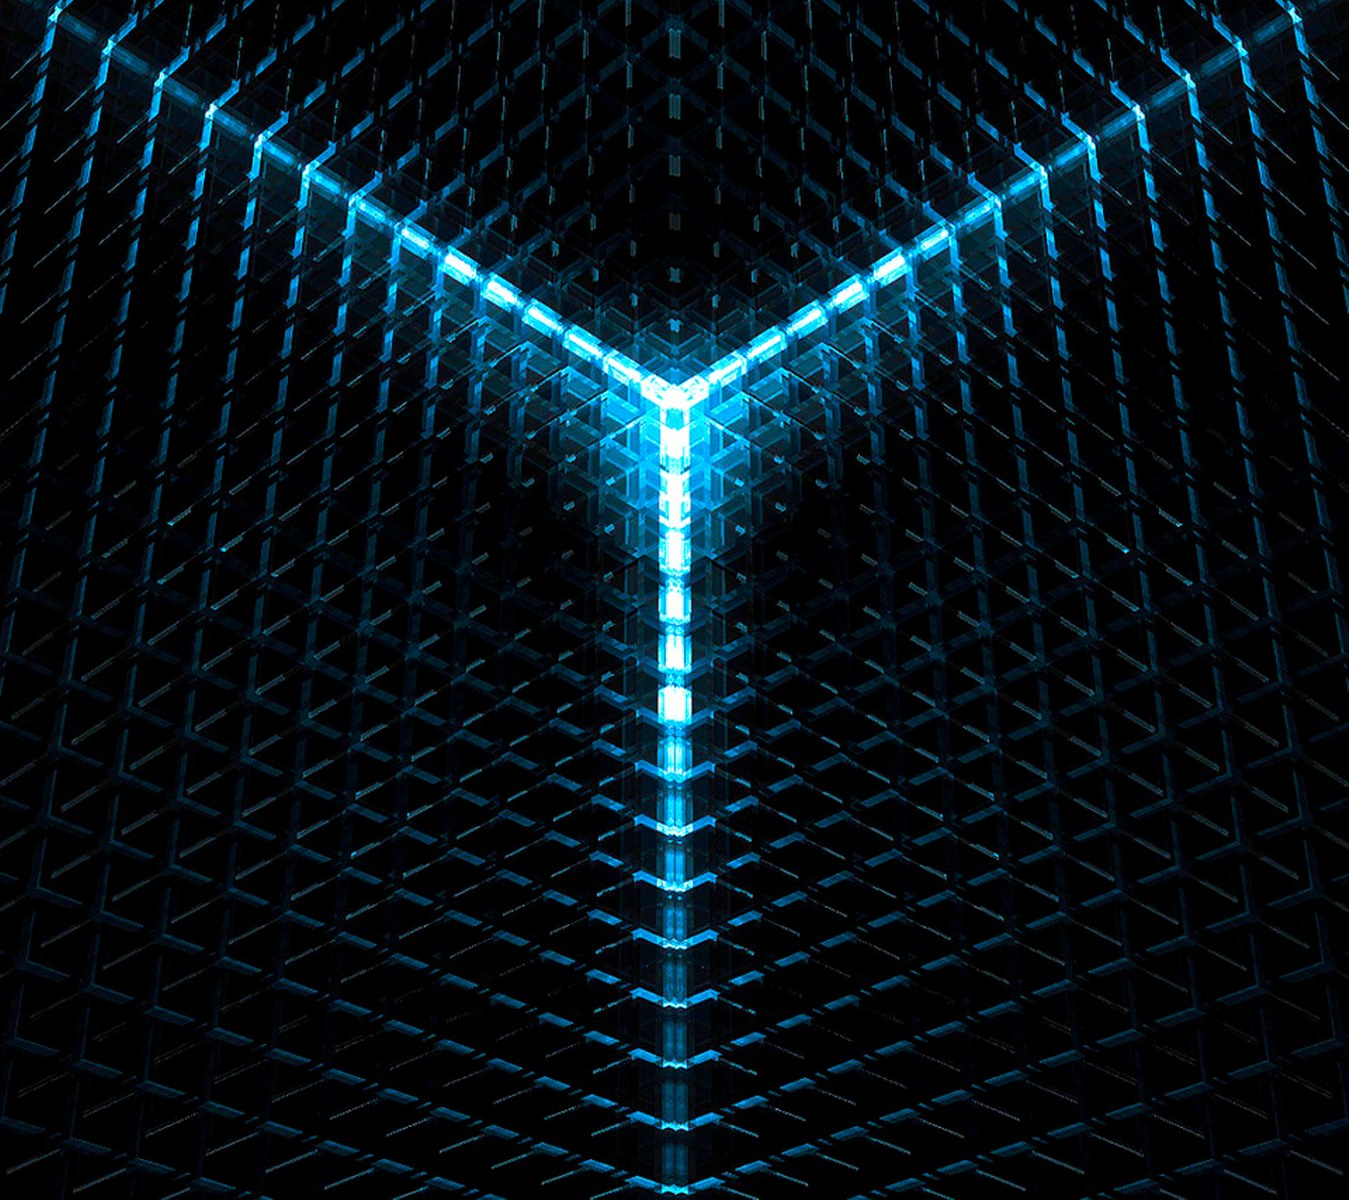 3d space wallpapers for desktop wallpapersafari wallpaper hd wallpapers wallpaper for your desktop smartphone tablet voltagebd Gallery